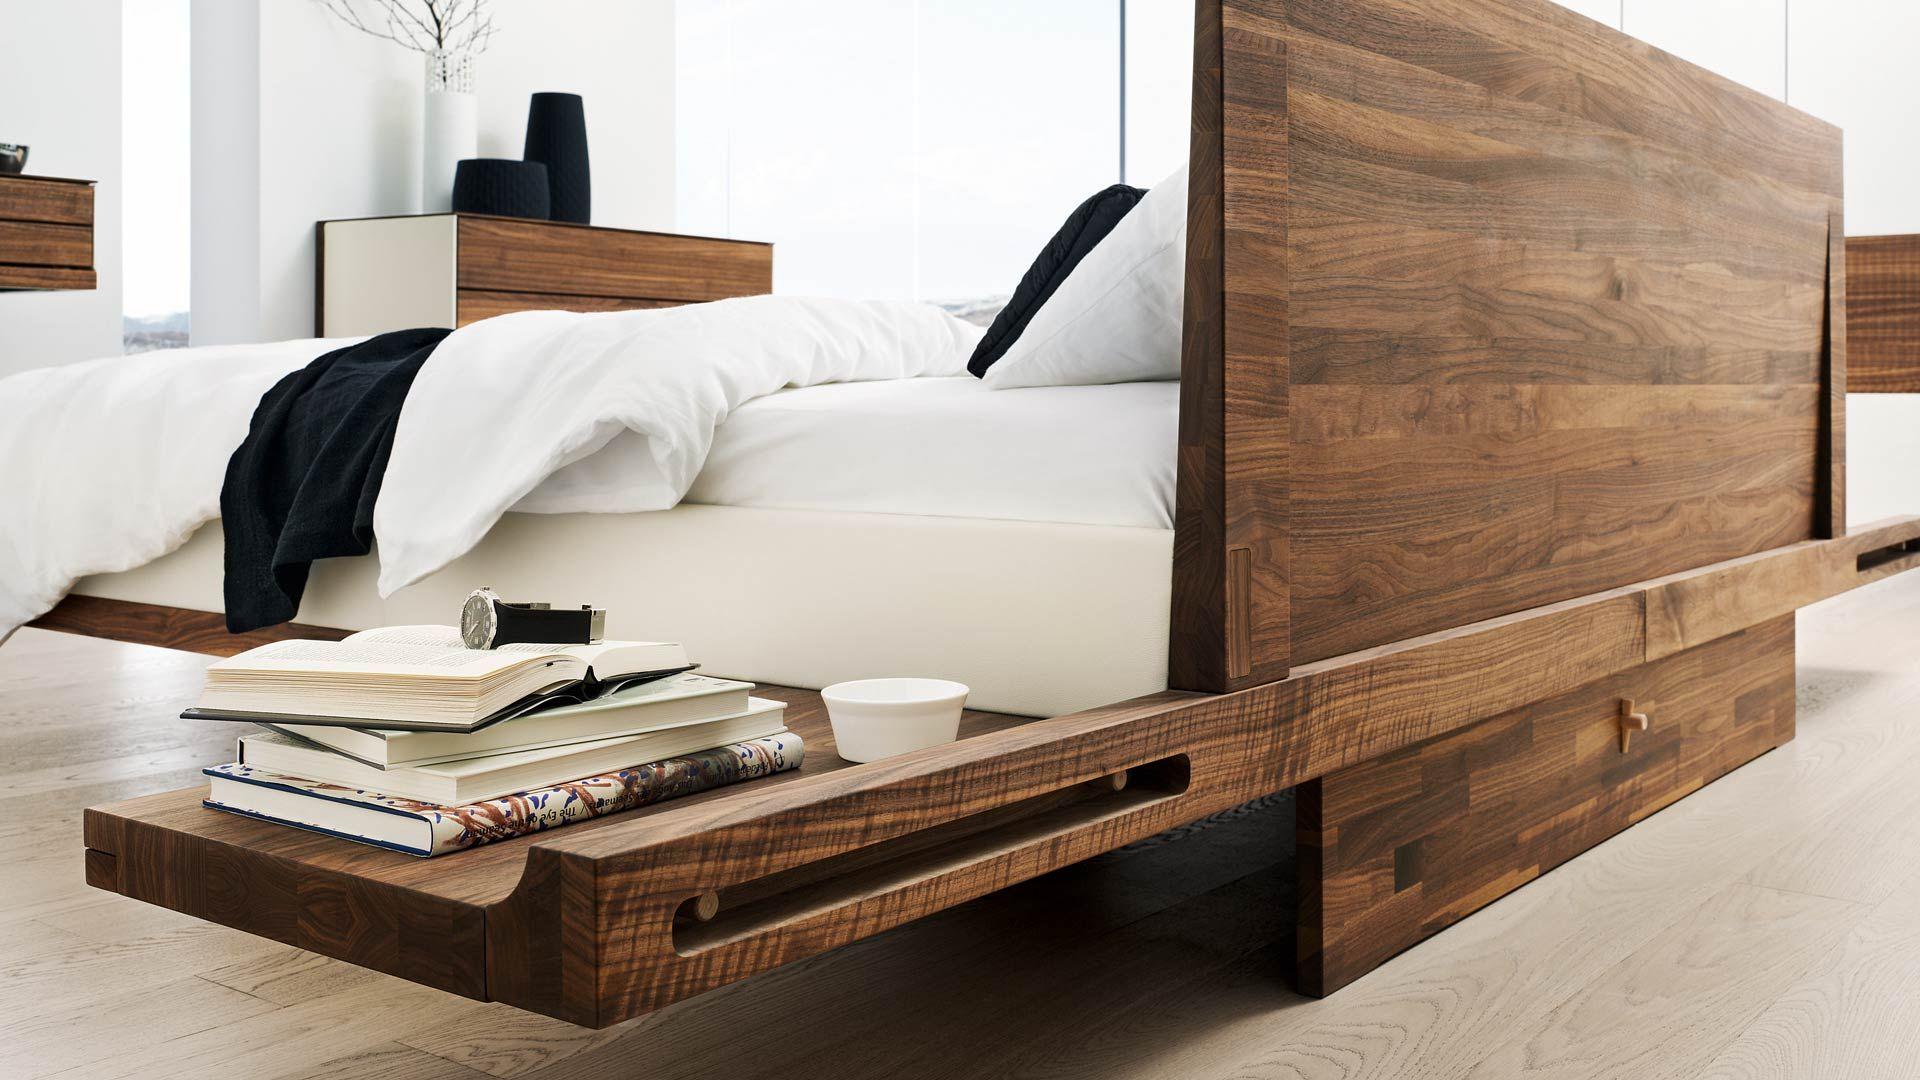 team7 aimages schlafen team7 riletto furniture pinterest camas. Black Bedroom Furniture Sets. Home Design Ideas